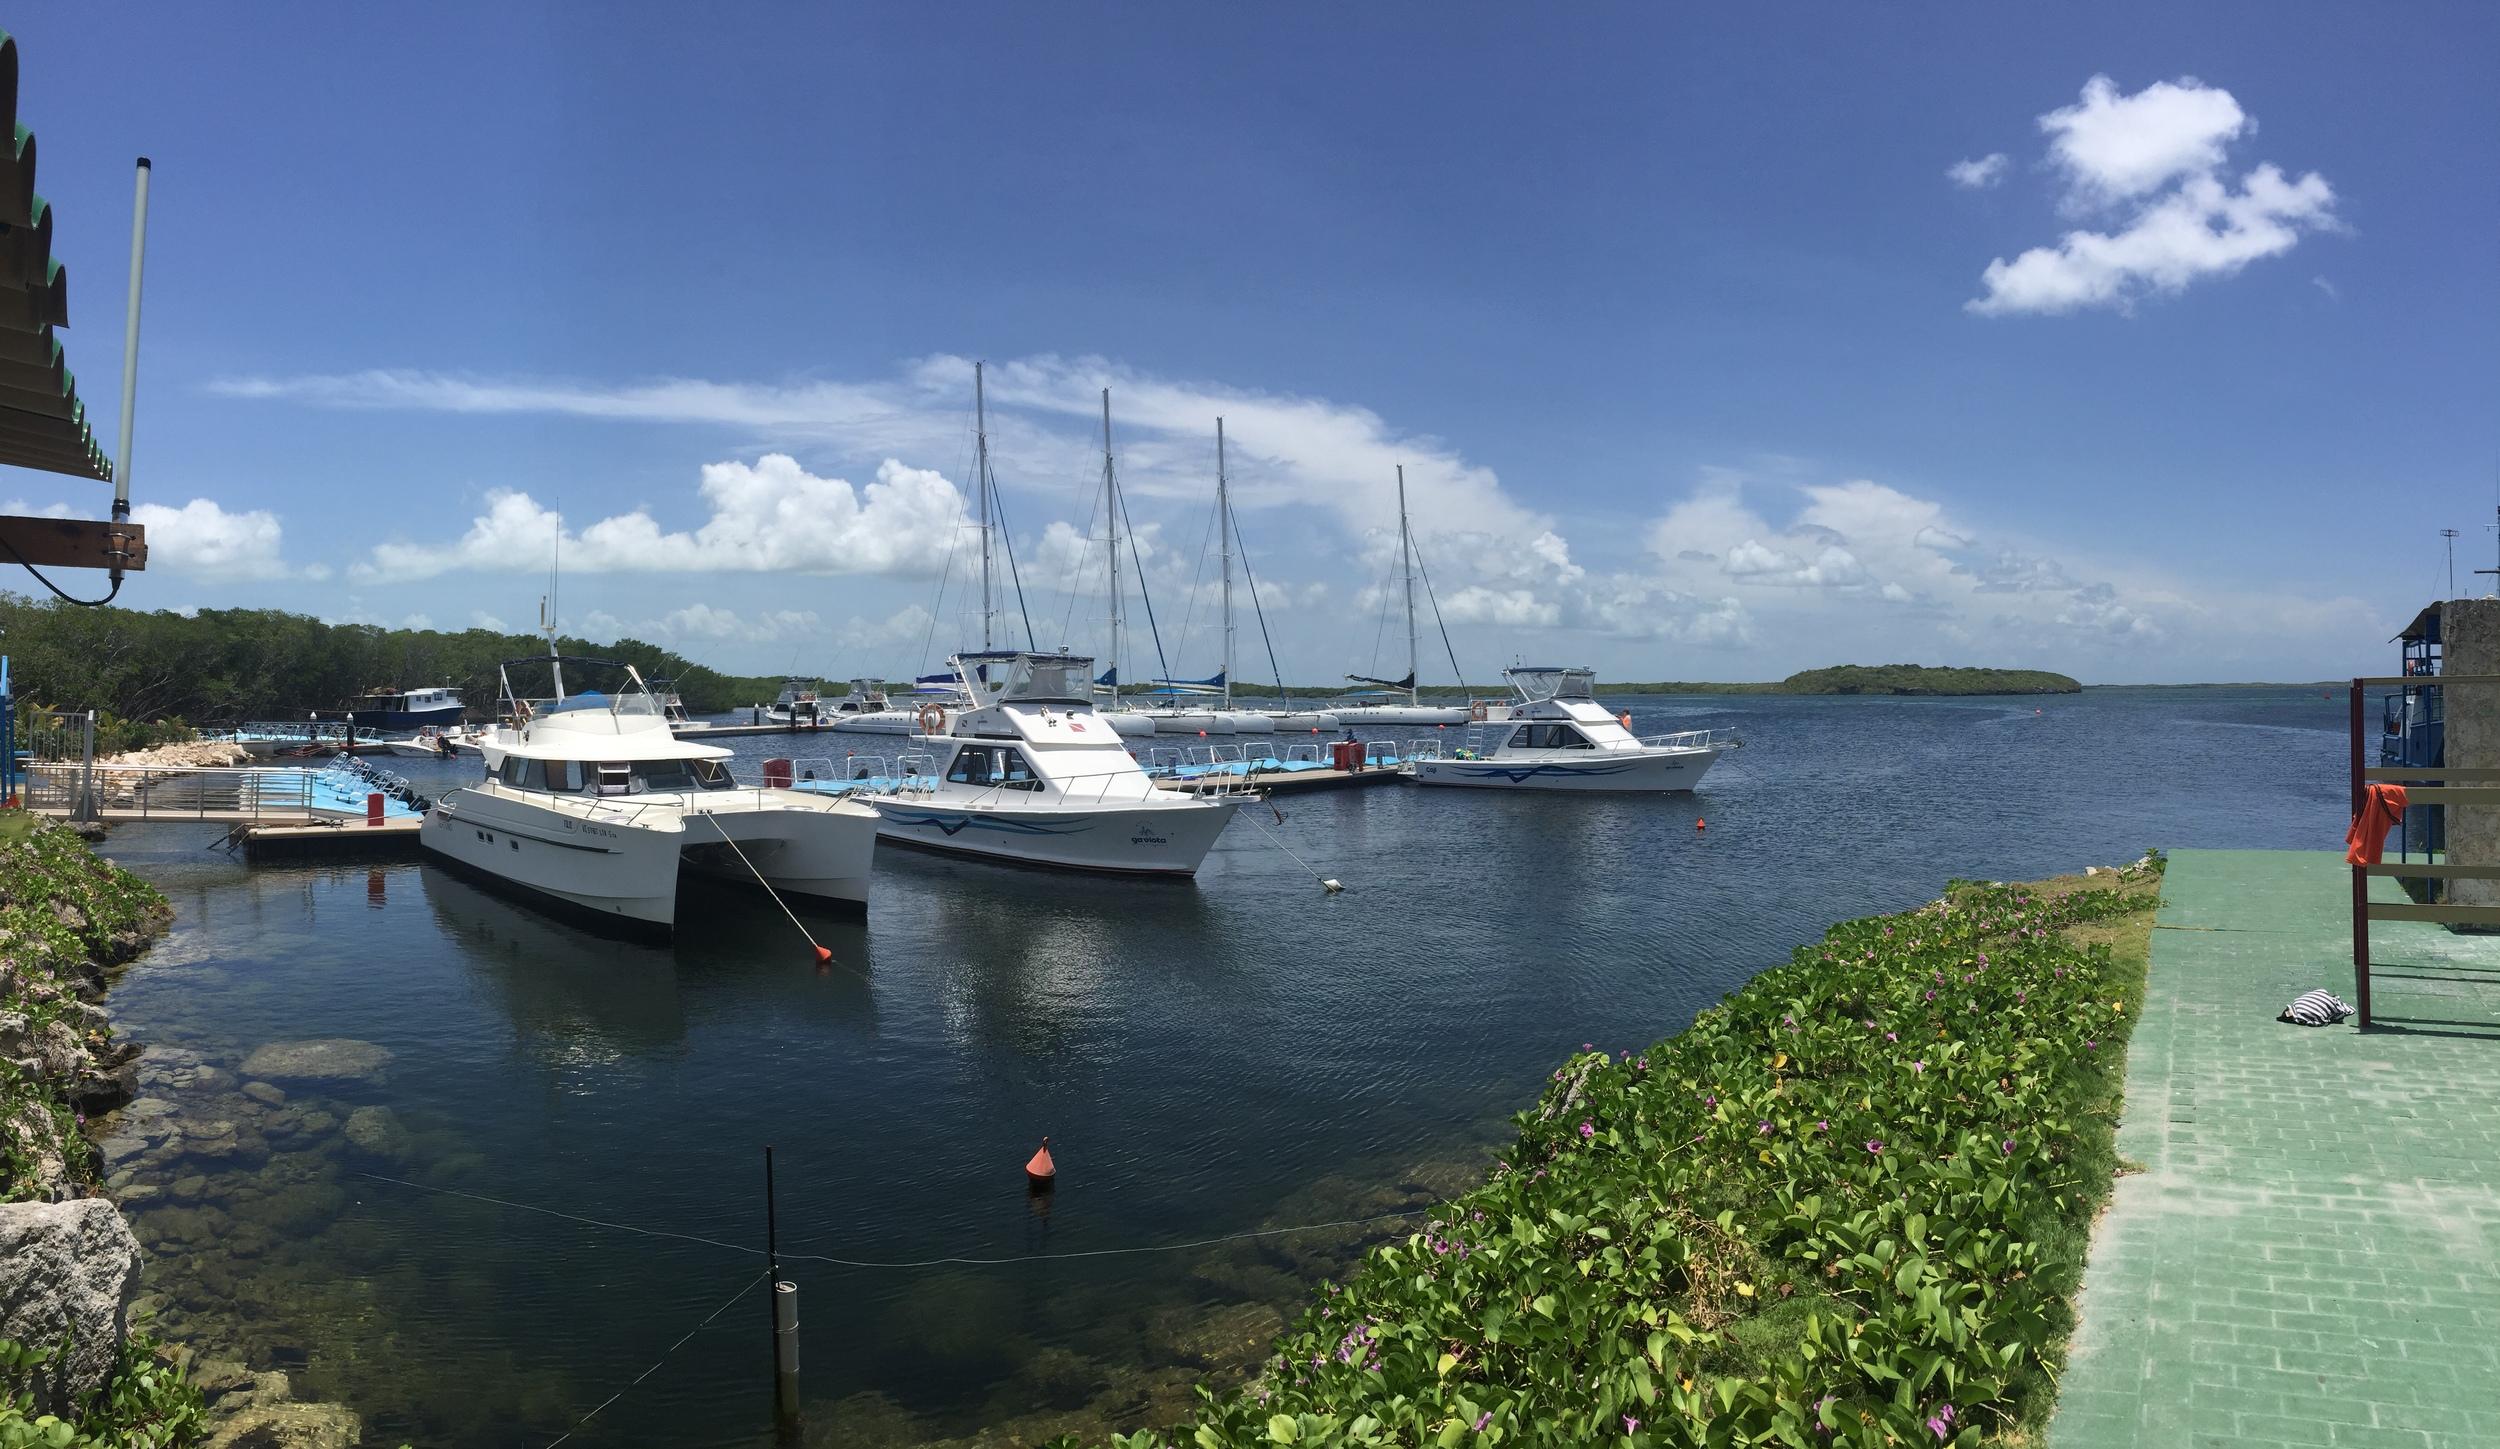 View of the marina near Villa Las Brujas, Cayo Santa Maria, Cuba